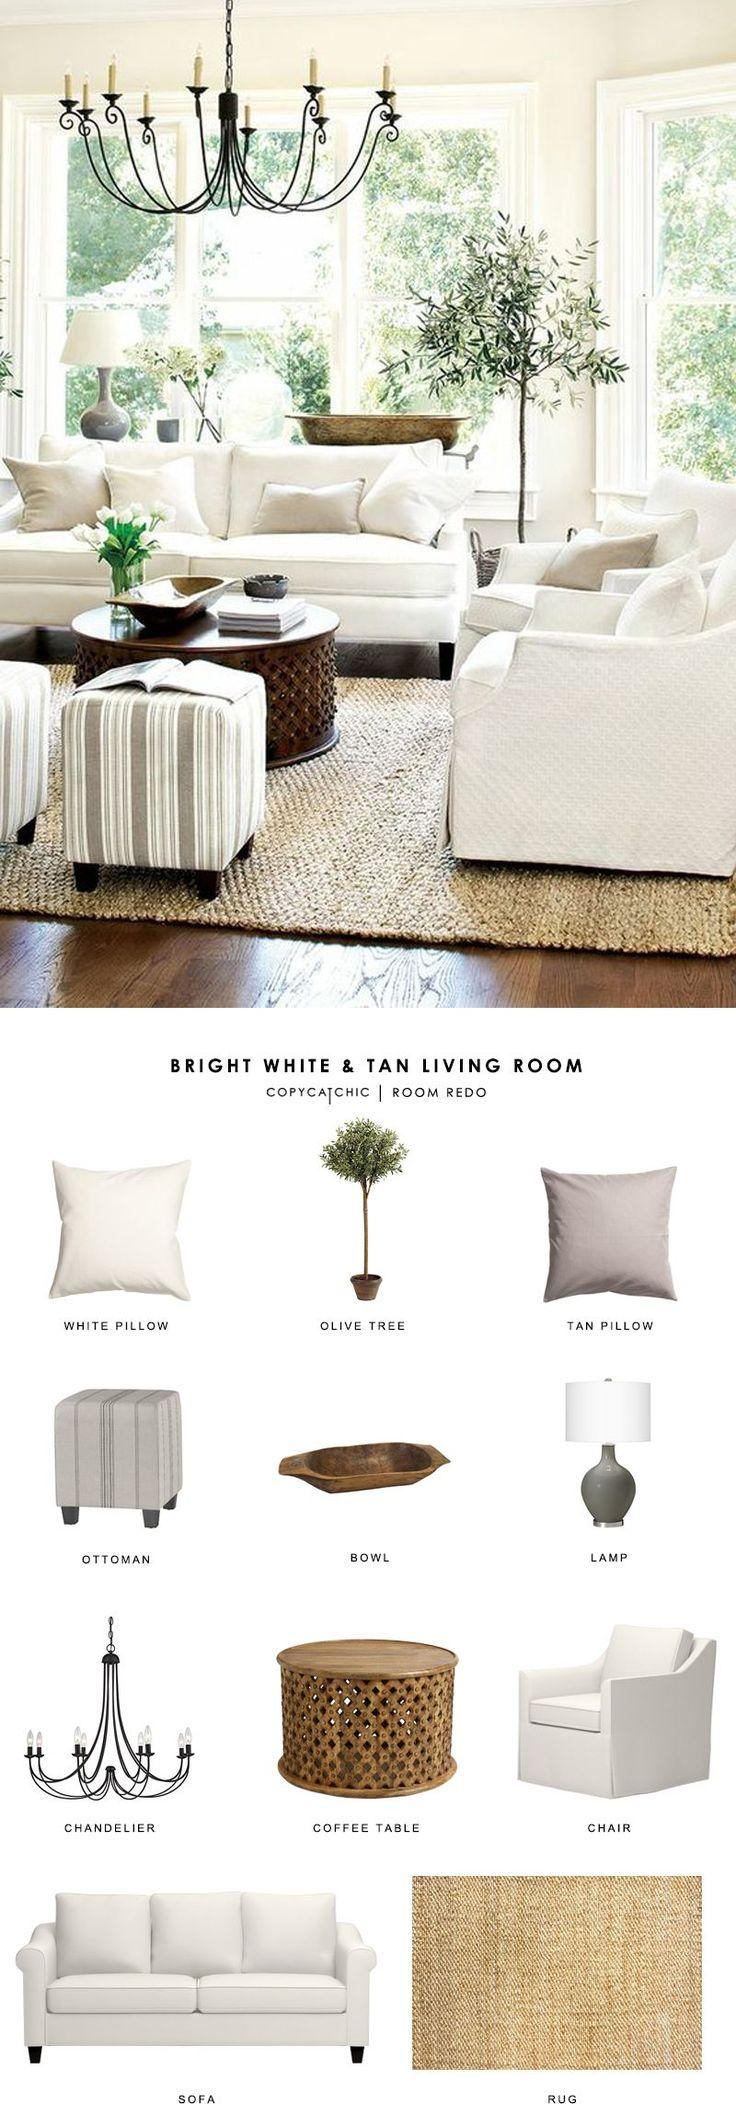 Copy Cat Chic Room Redo. Tan Living RoomsFarmhouse ...